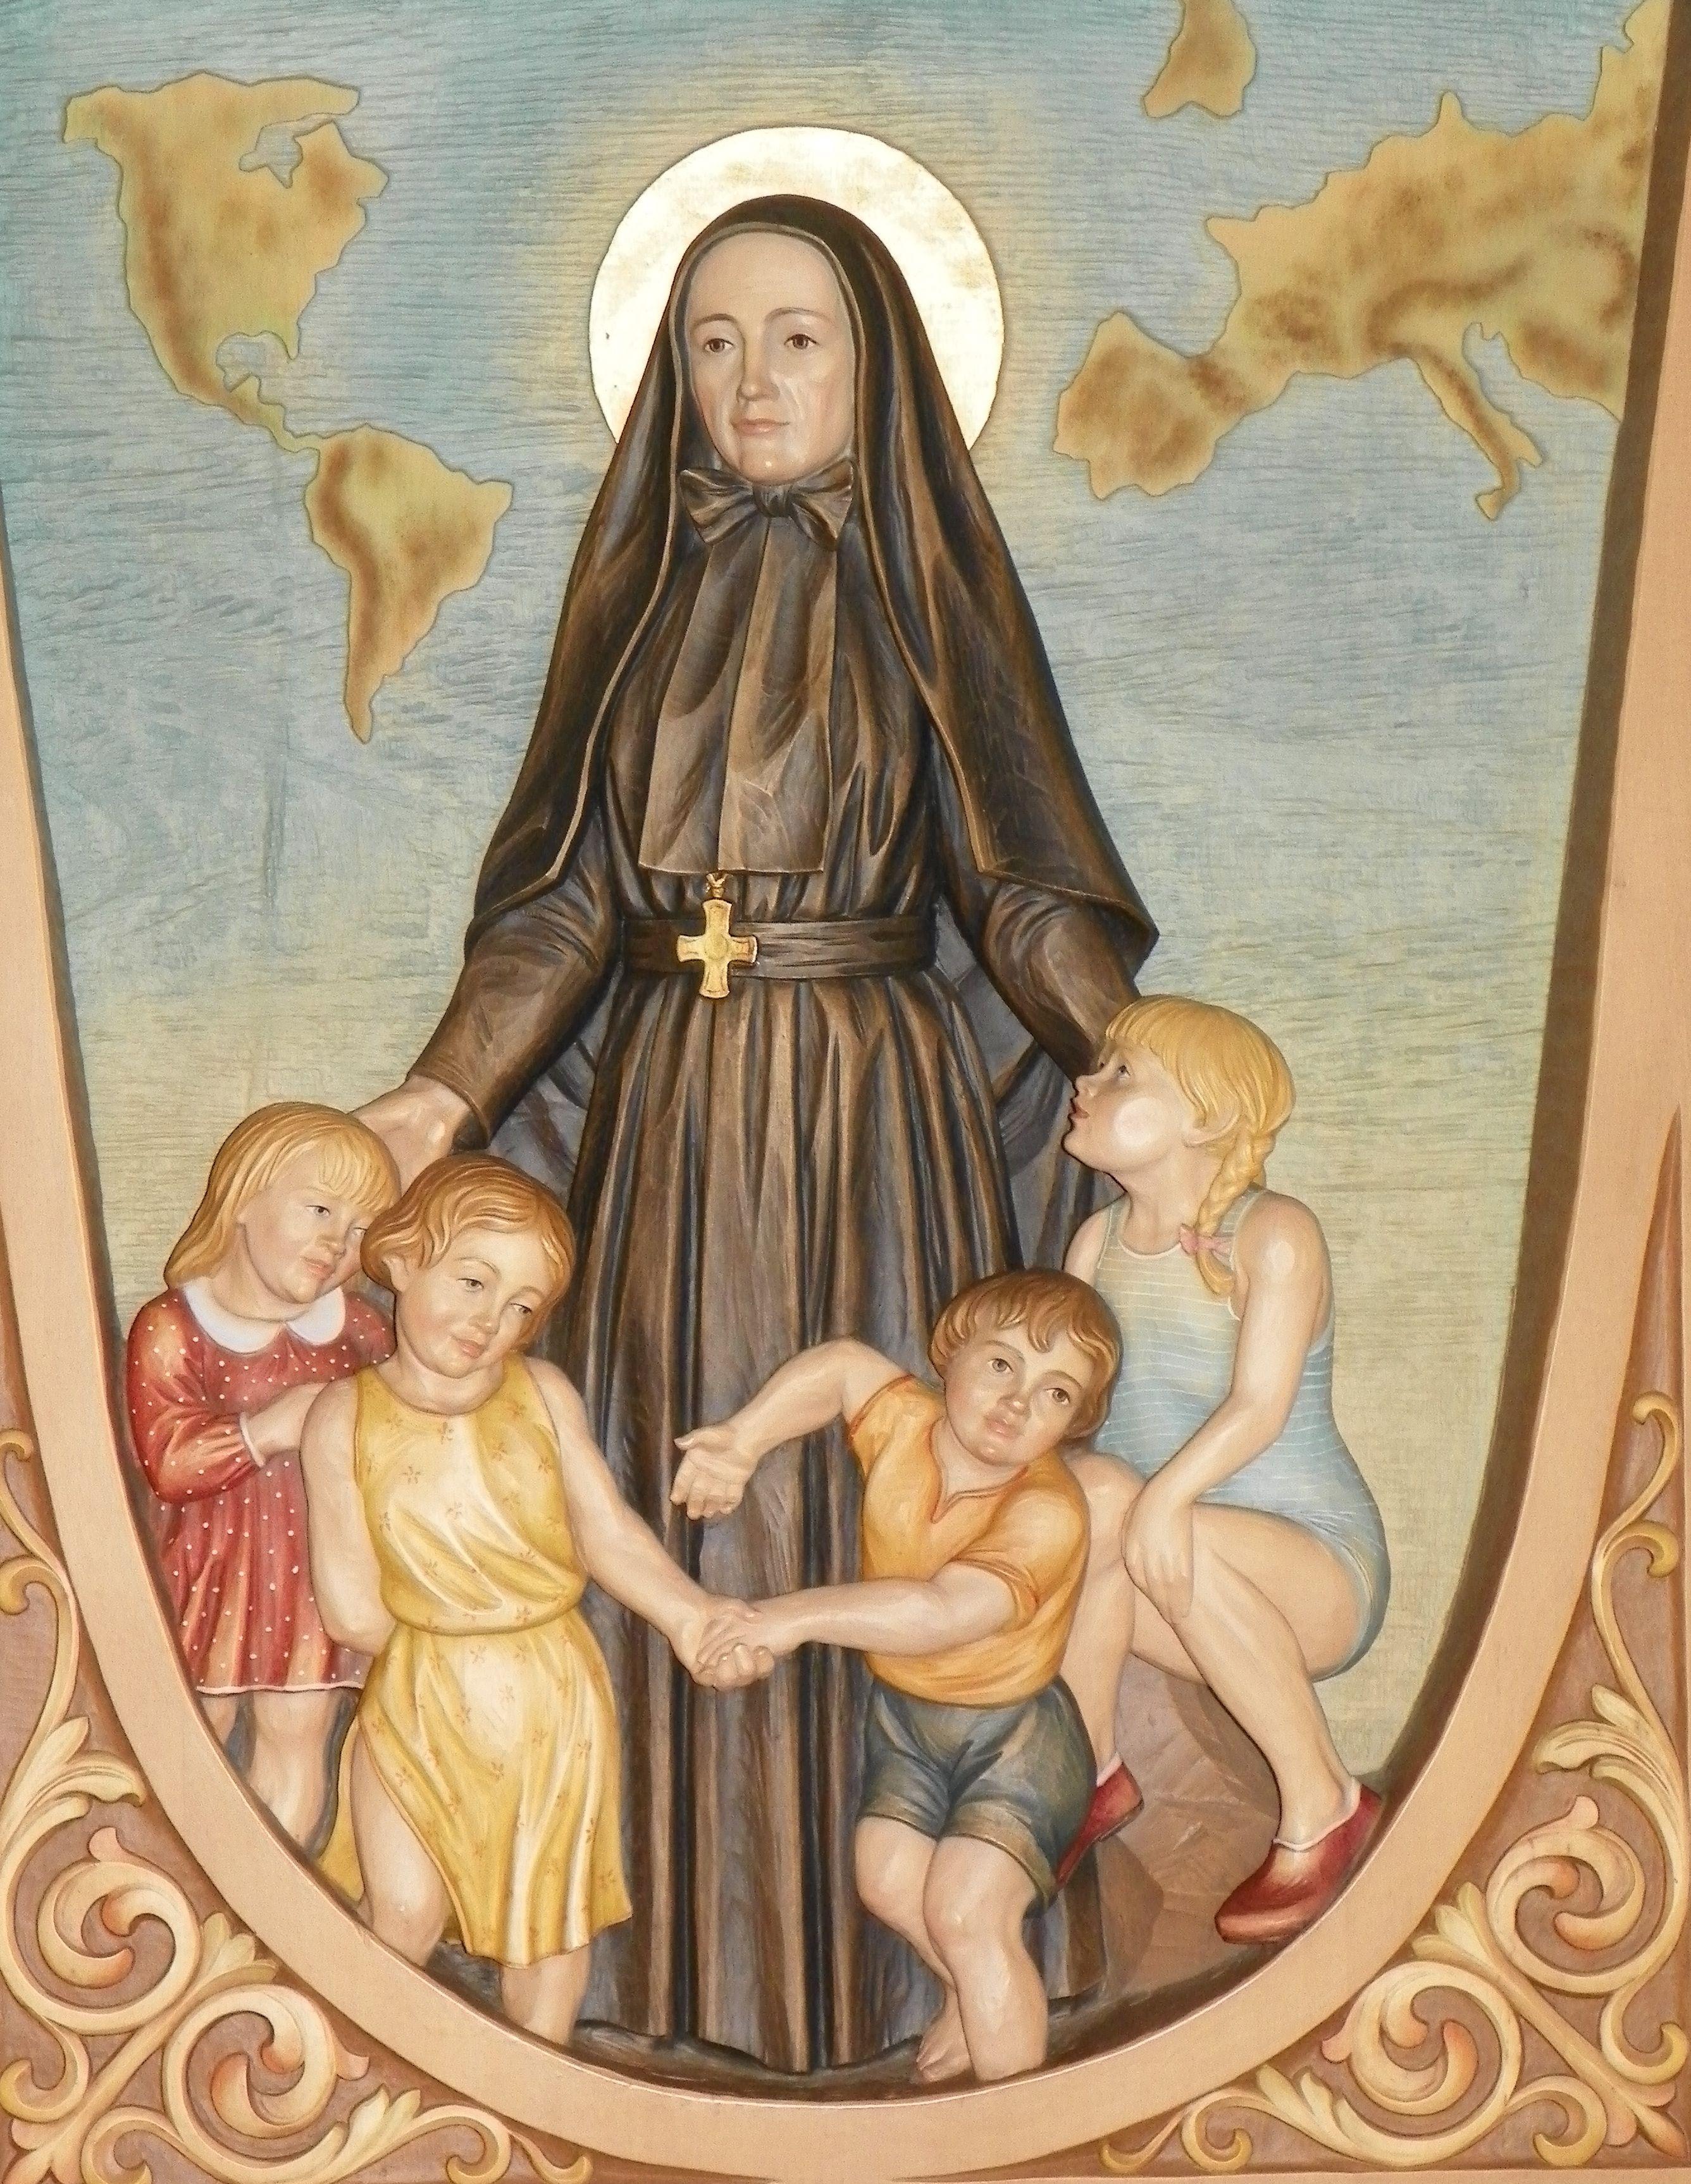 Patron saint of young girls